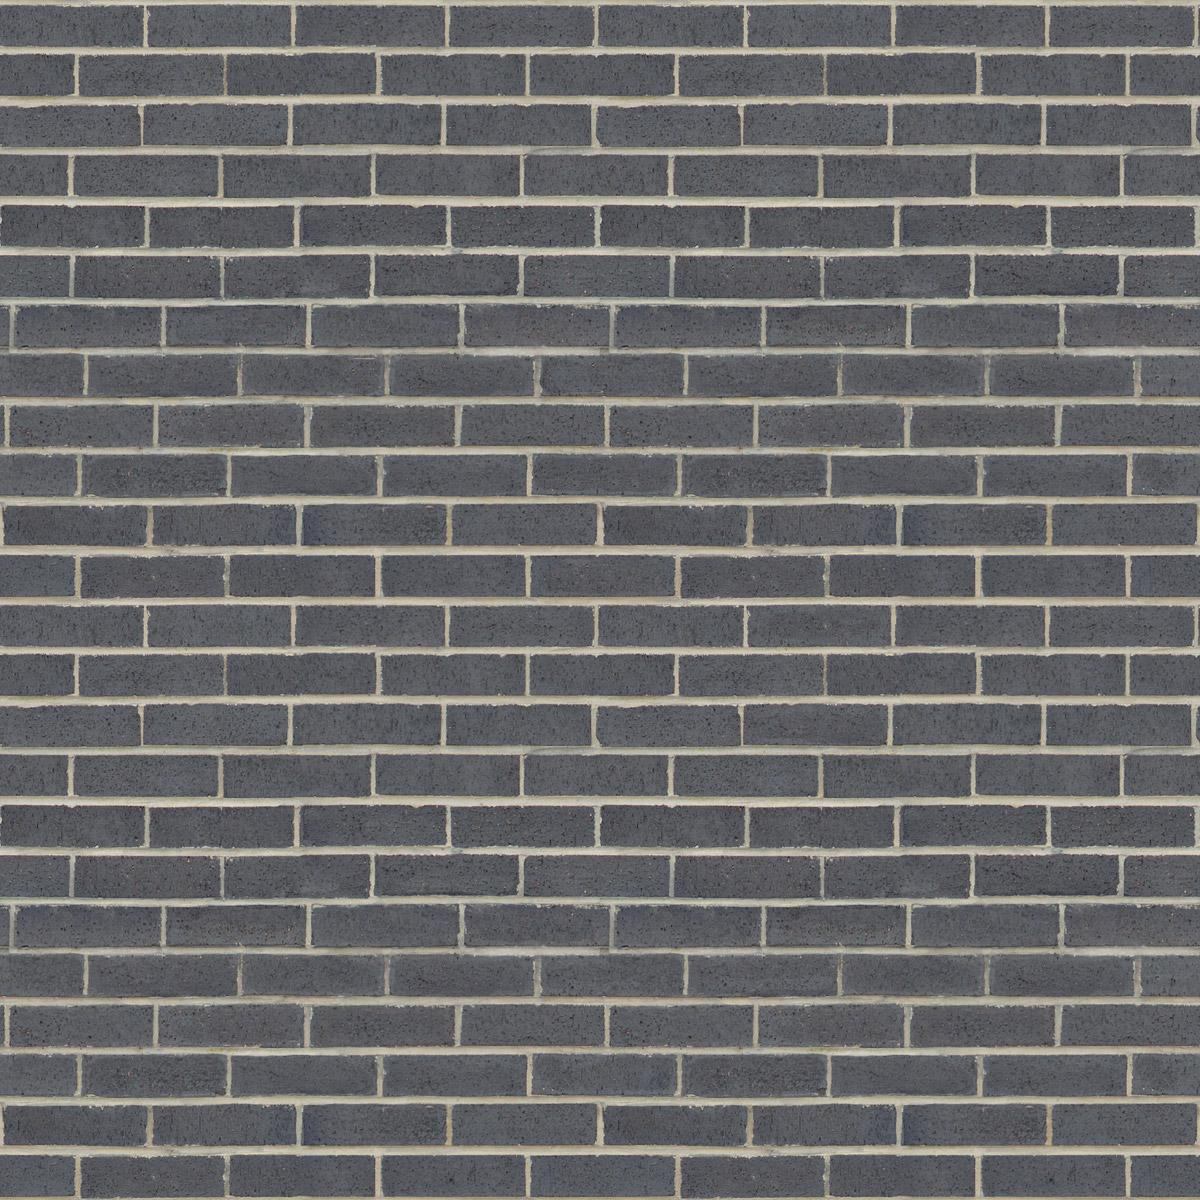 Tileable Grey Brick Wall Texture Maps